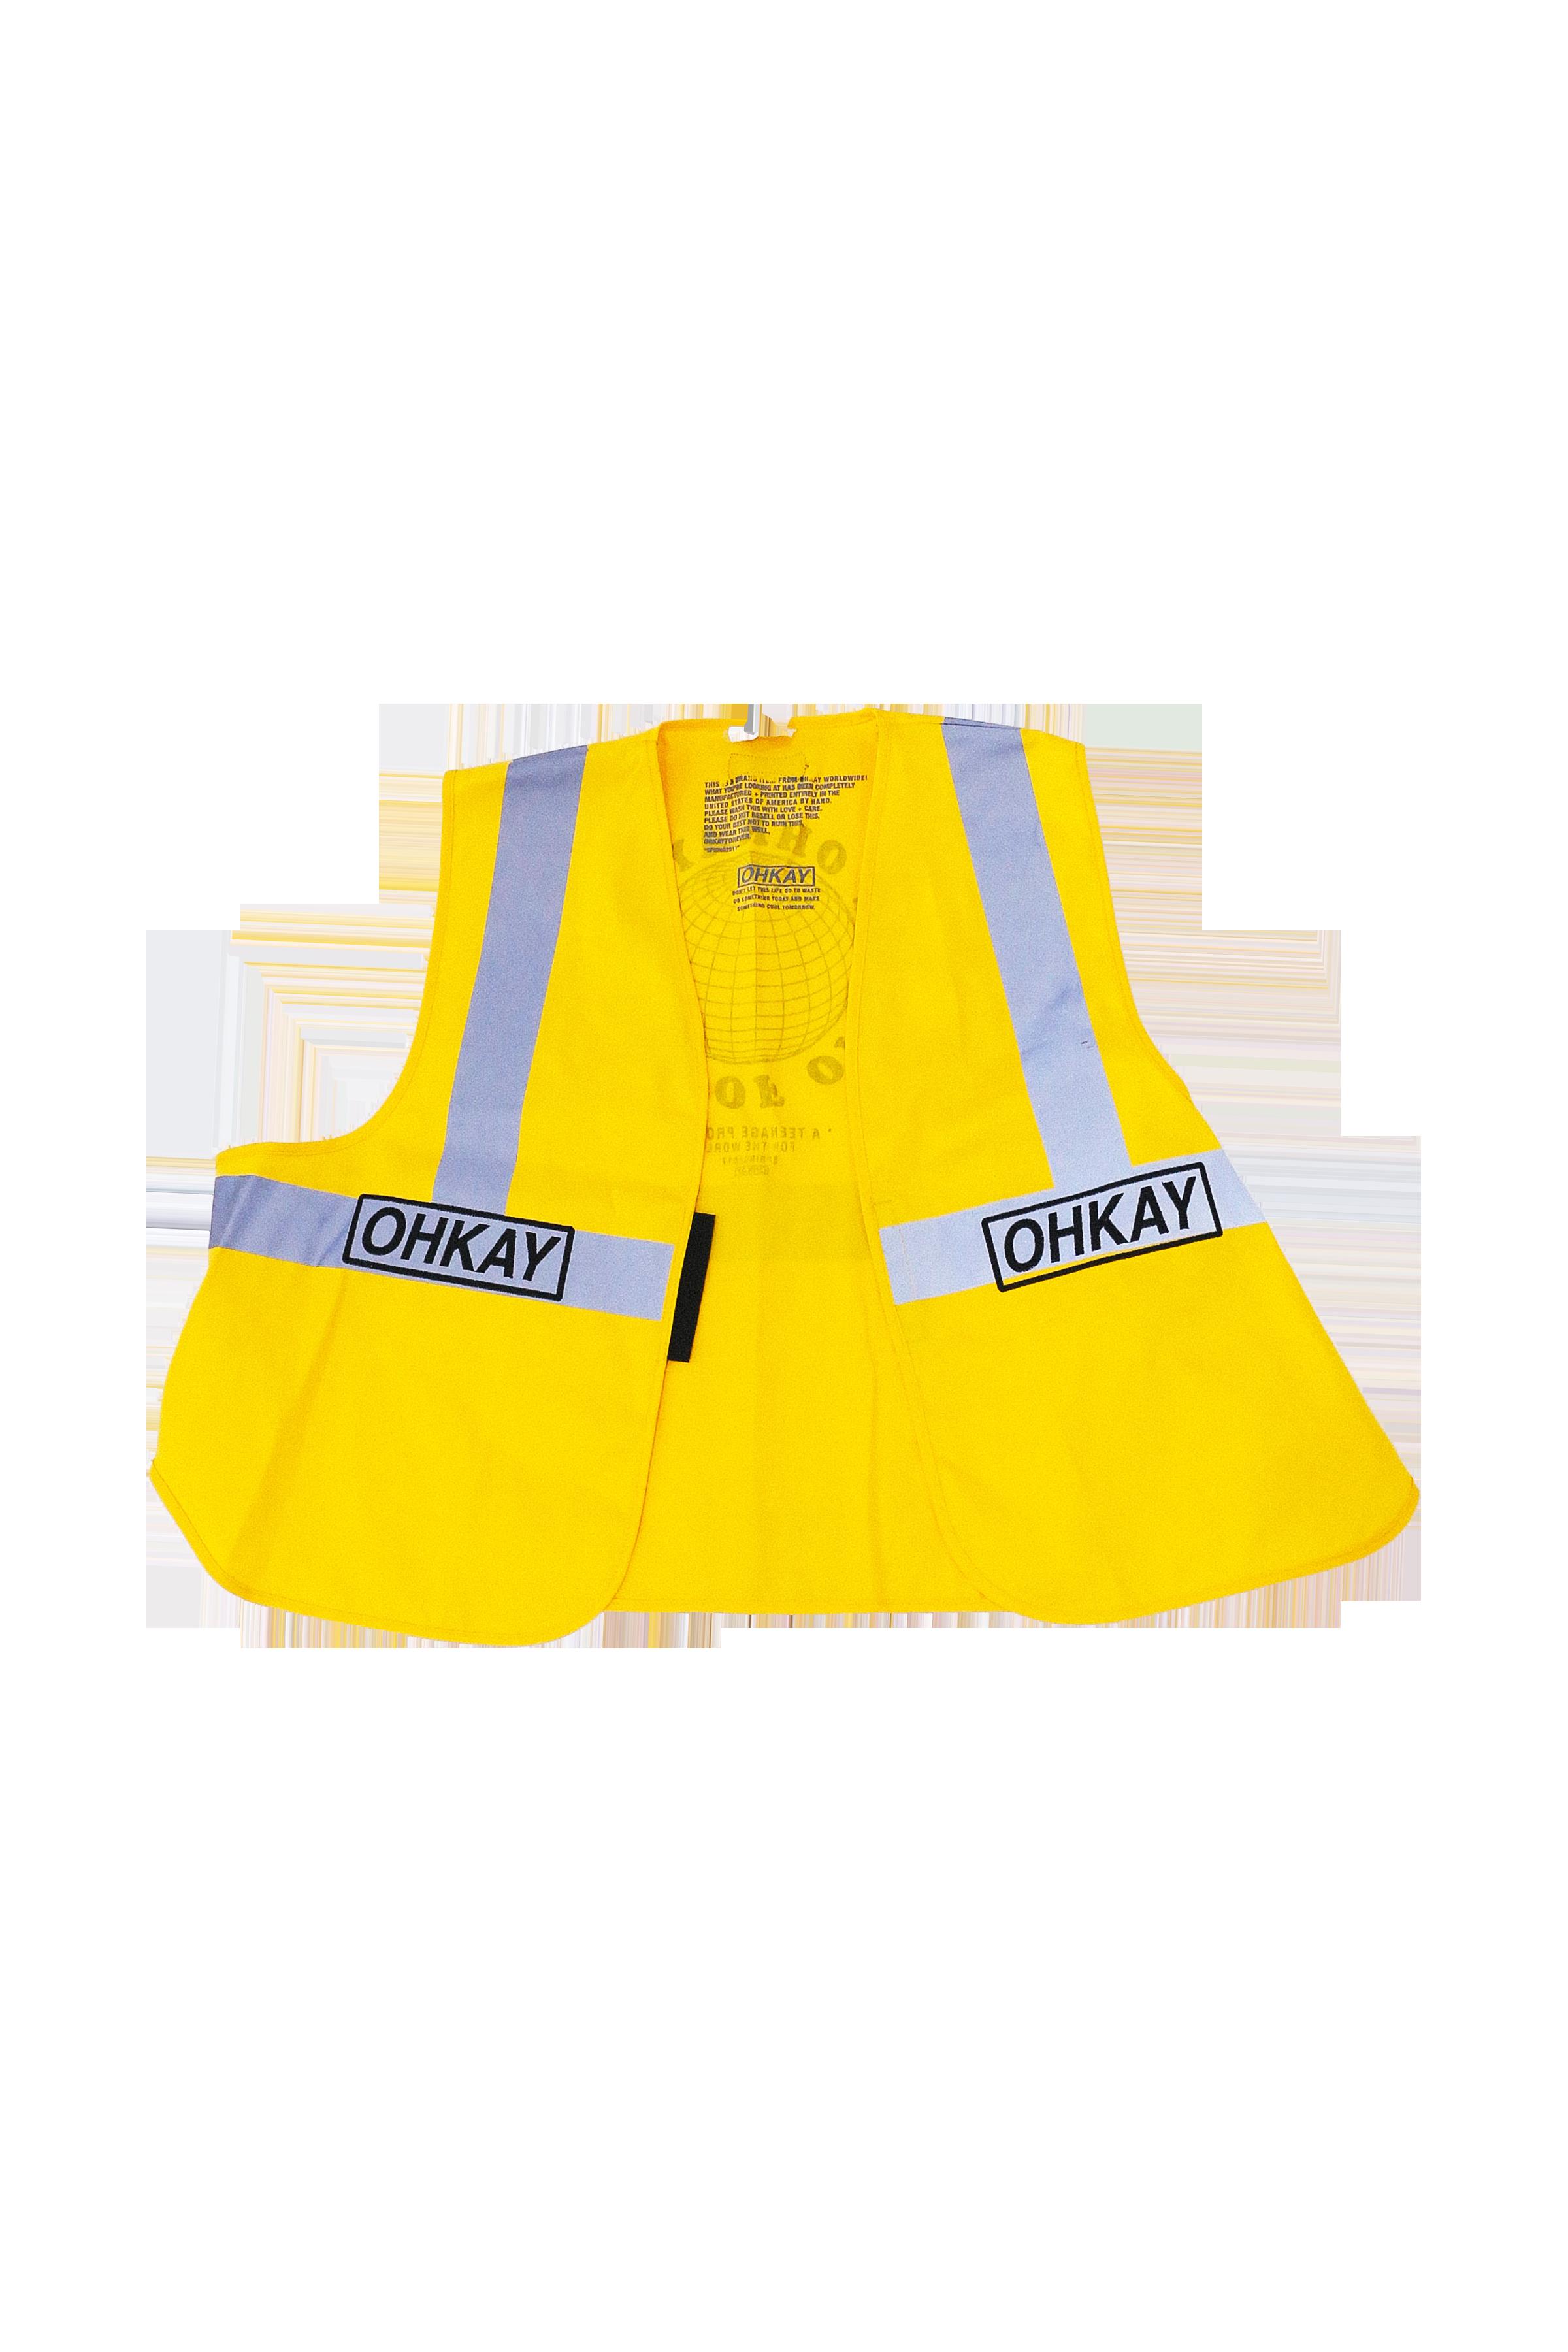 reflective vest.png